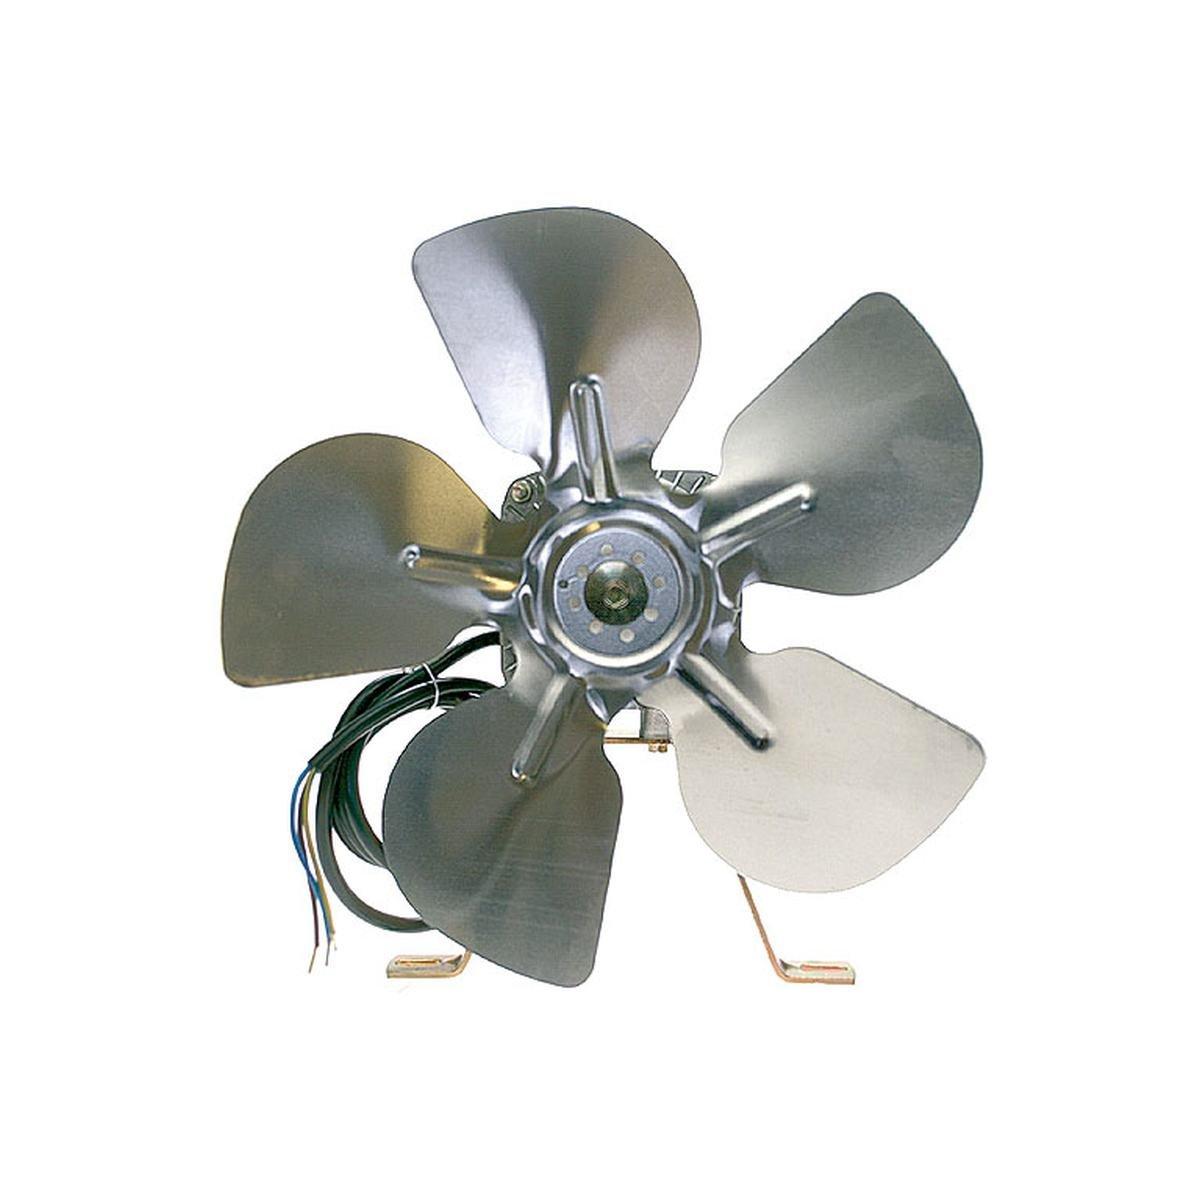 Ventilator 16W med vingediameter 300 mm. - Elco